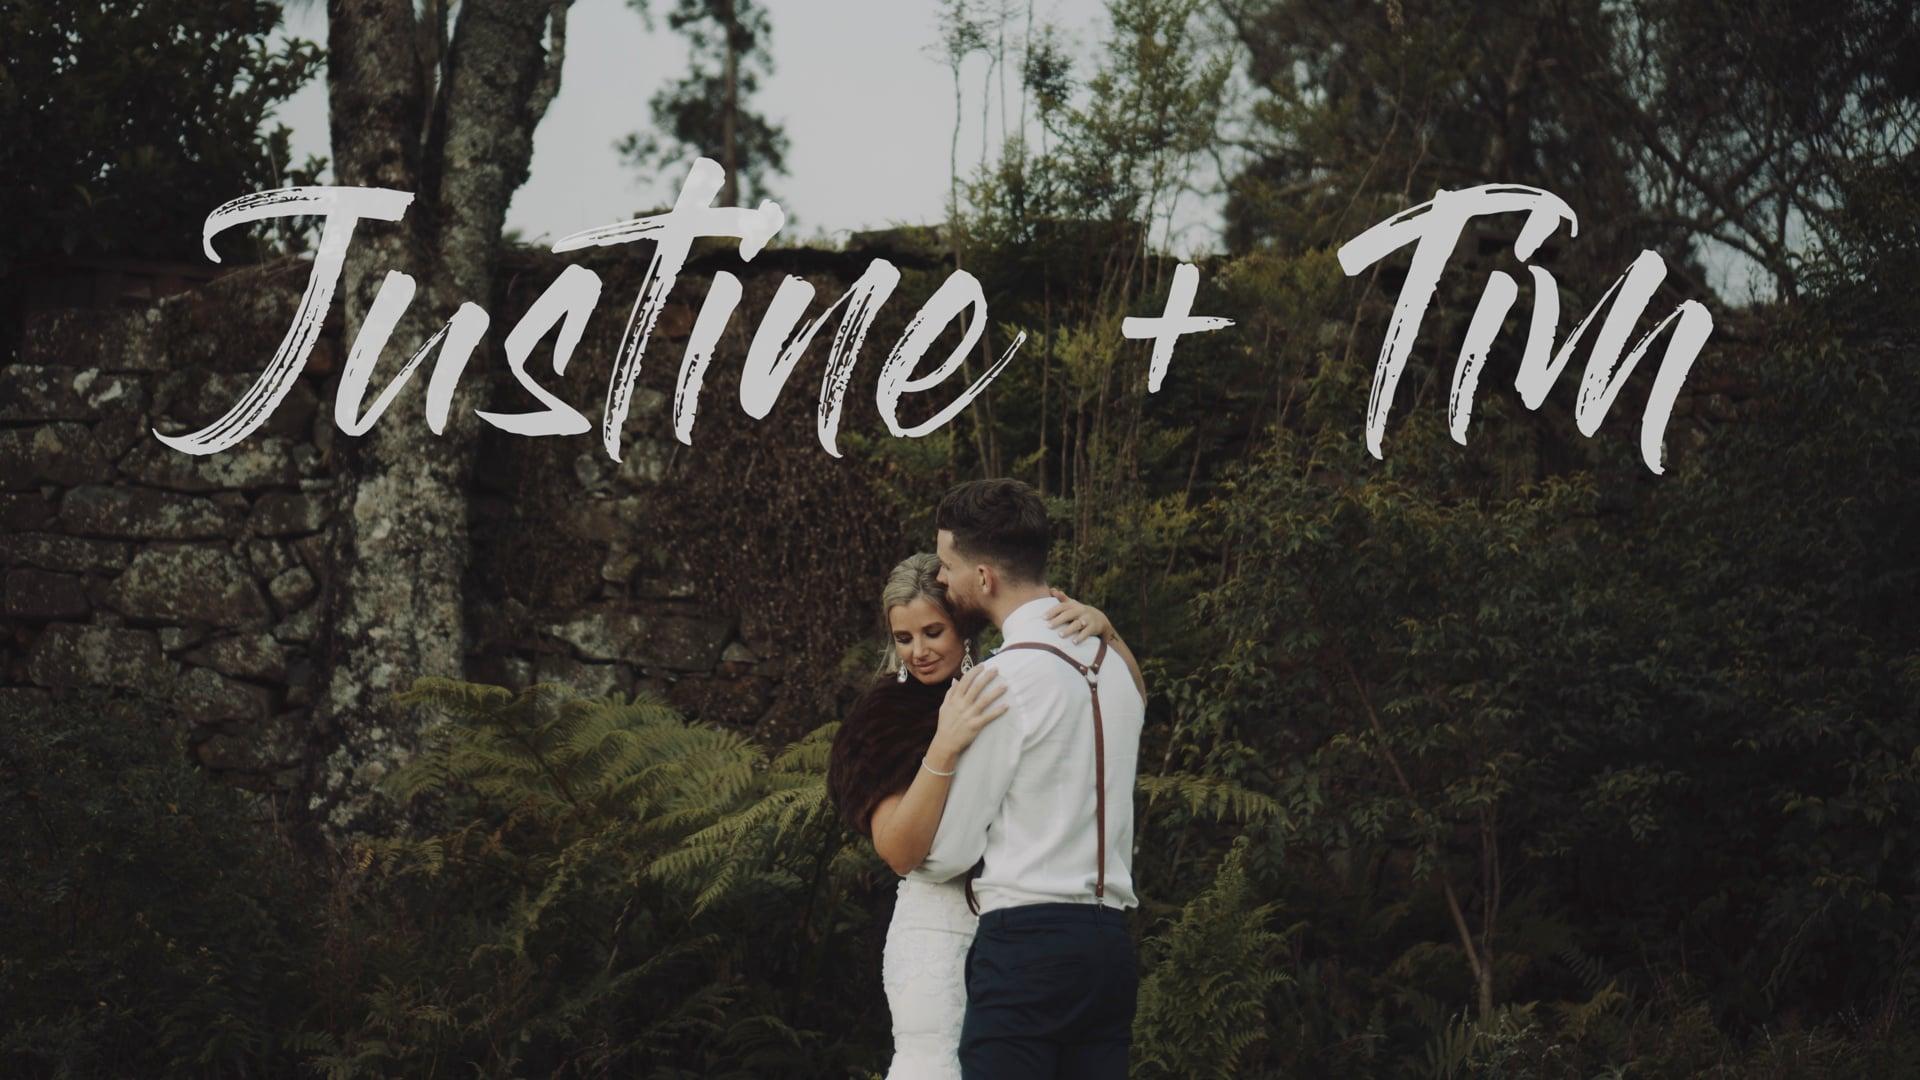 Justine + Tim - Cinematic Film